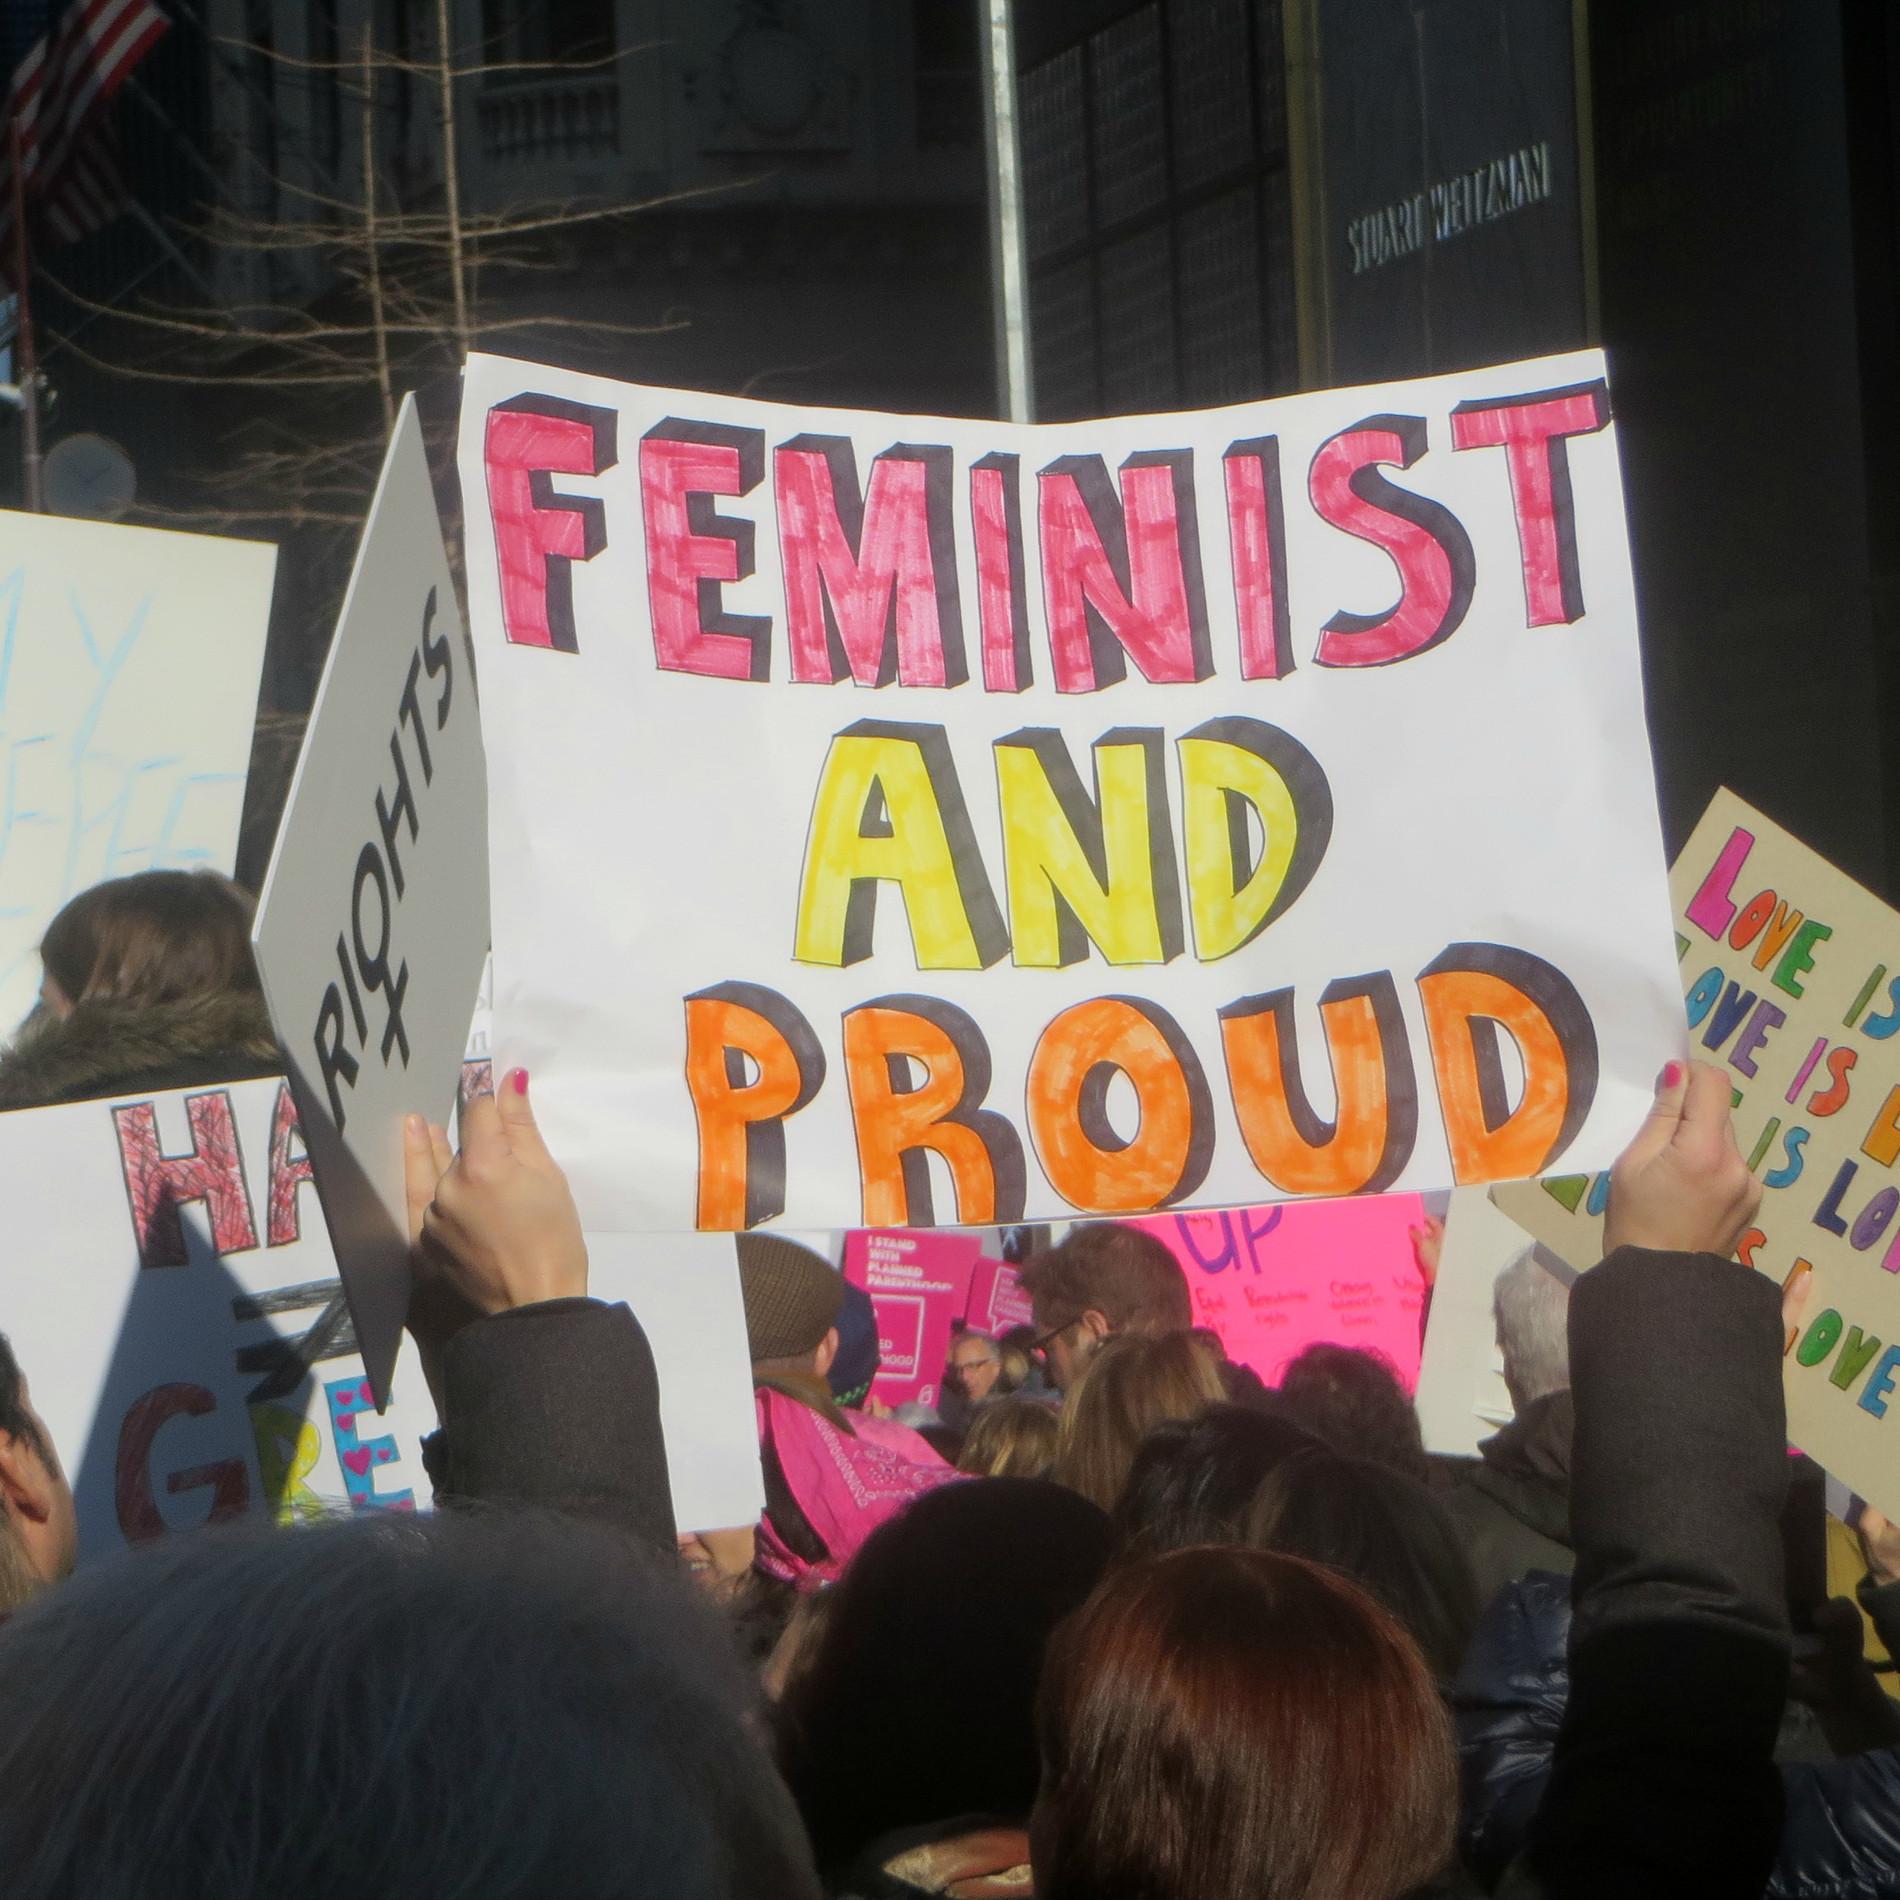 Feminist and Proud 32430356306 859b3